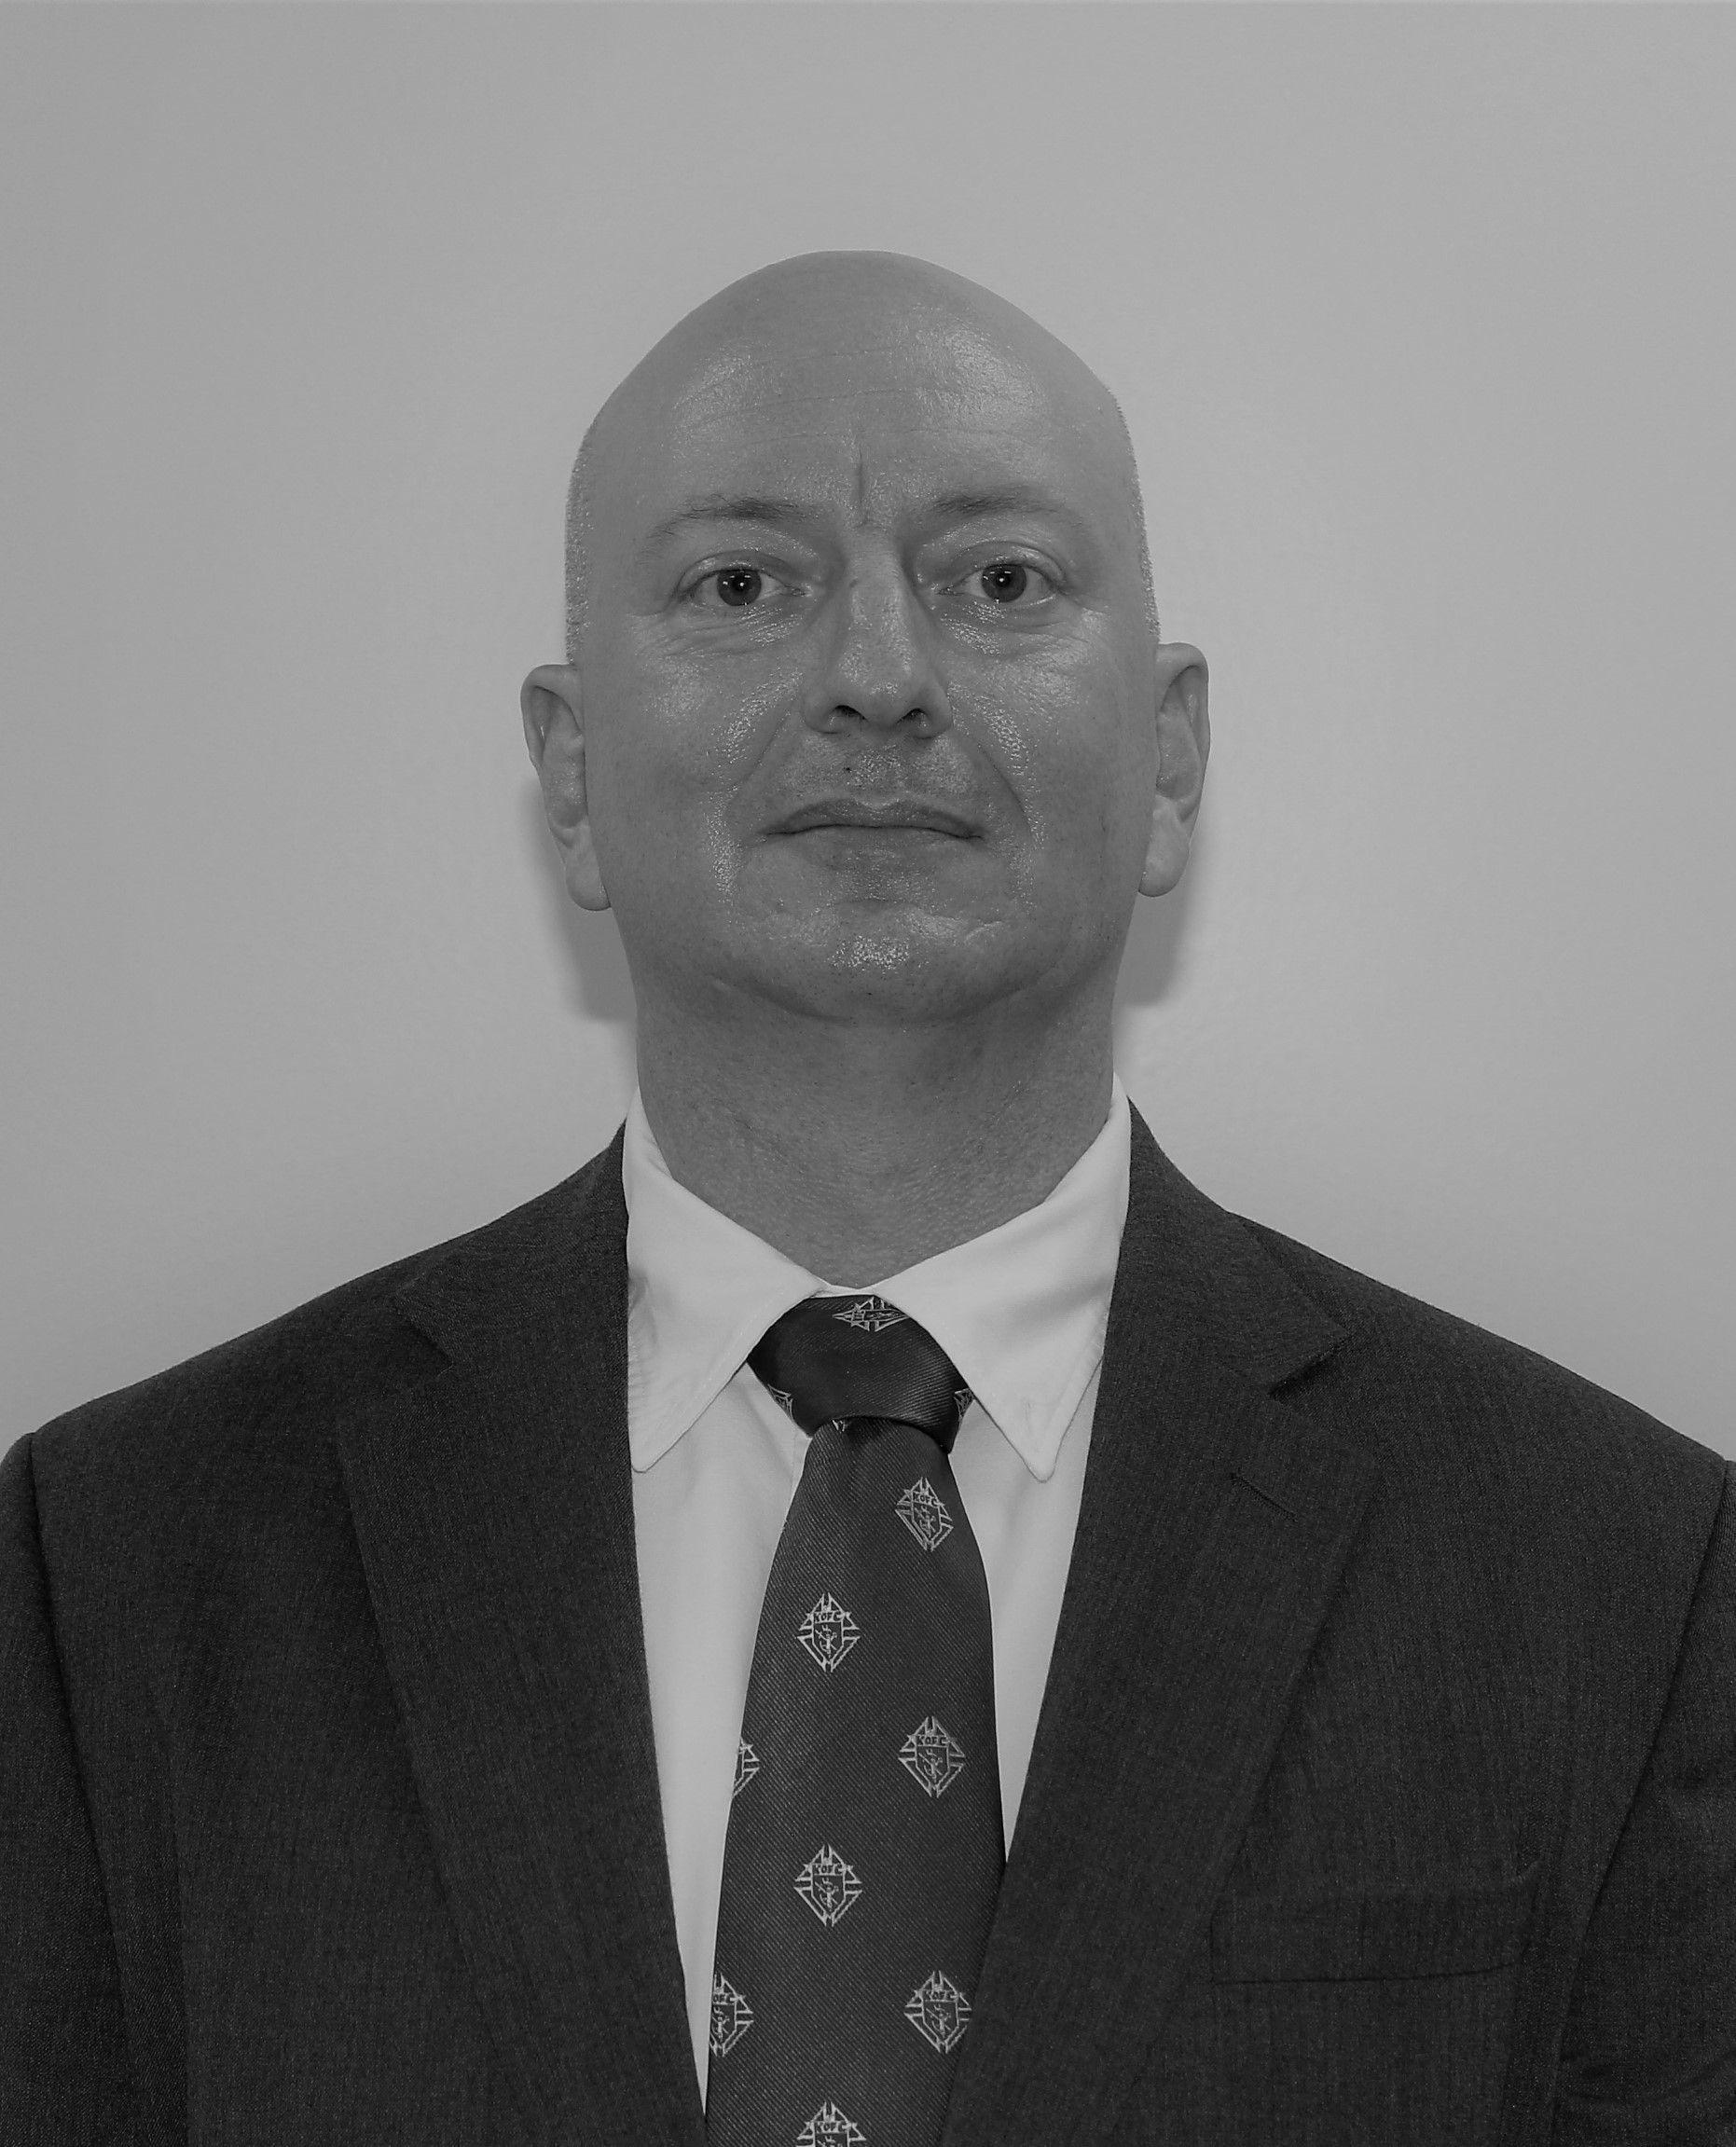 Kevin Ostdiek